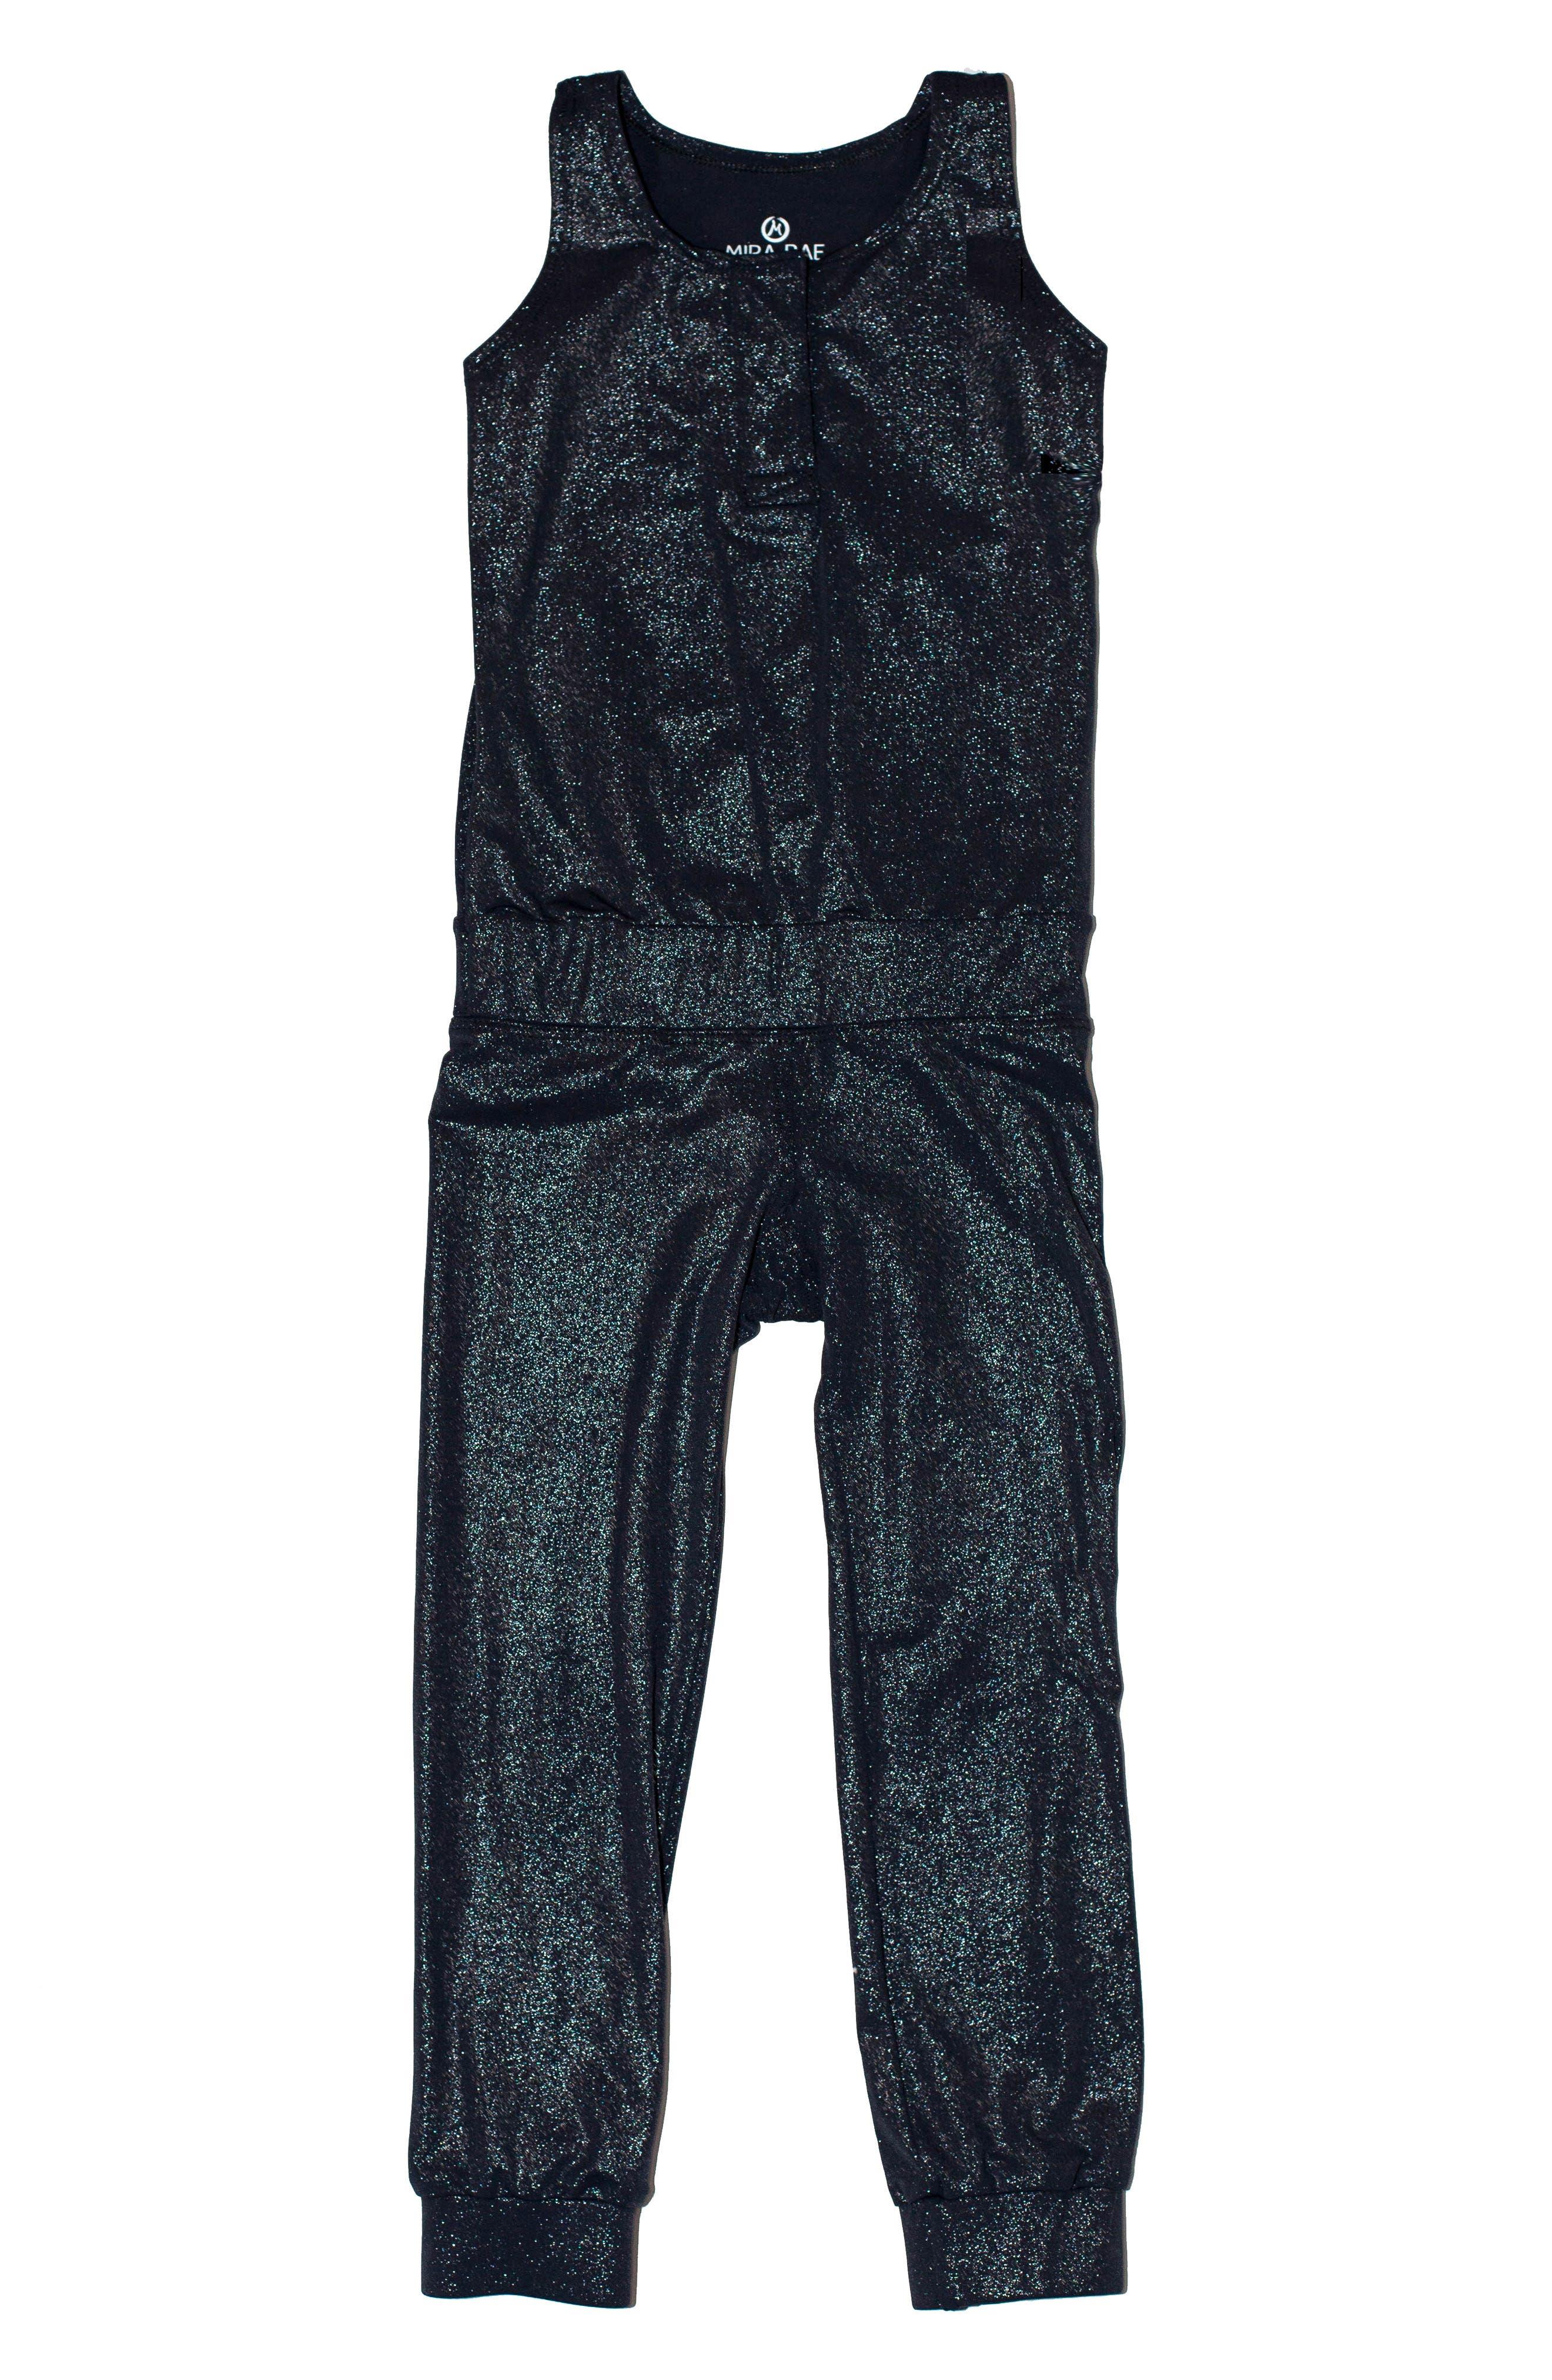 MIRA RAE Riya Metallic Jumpsuit, Main, color, MOONLESS NIGHT